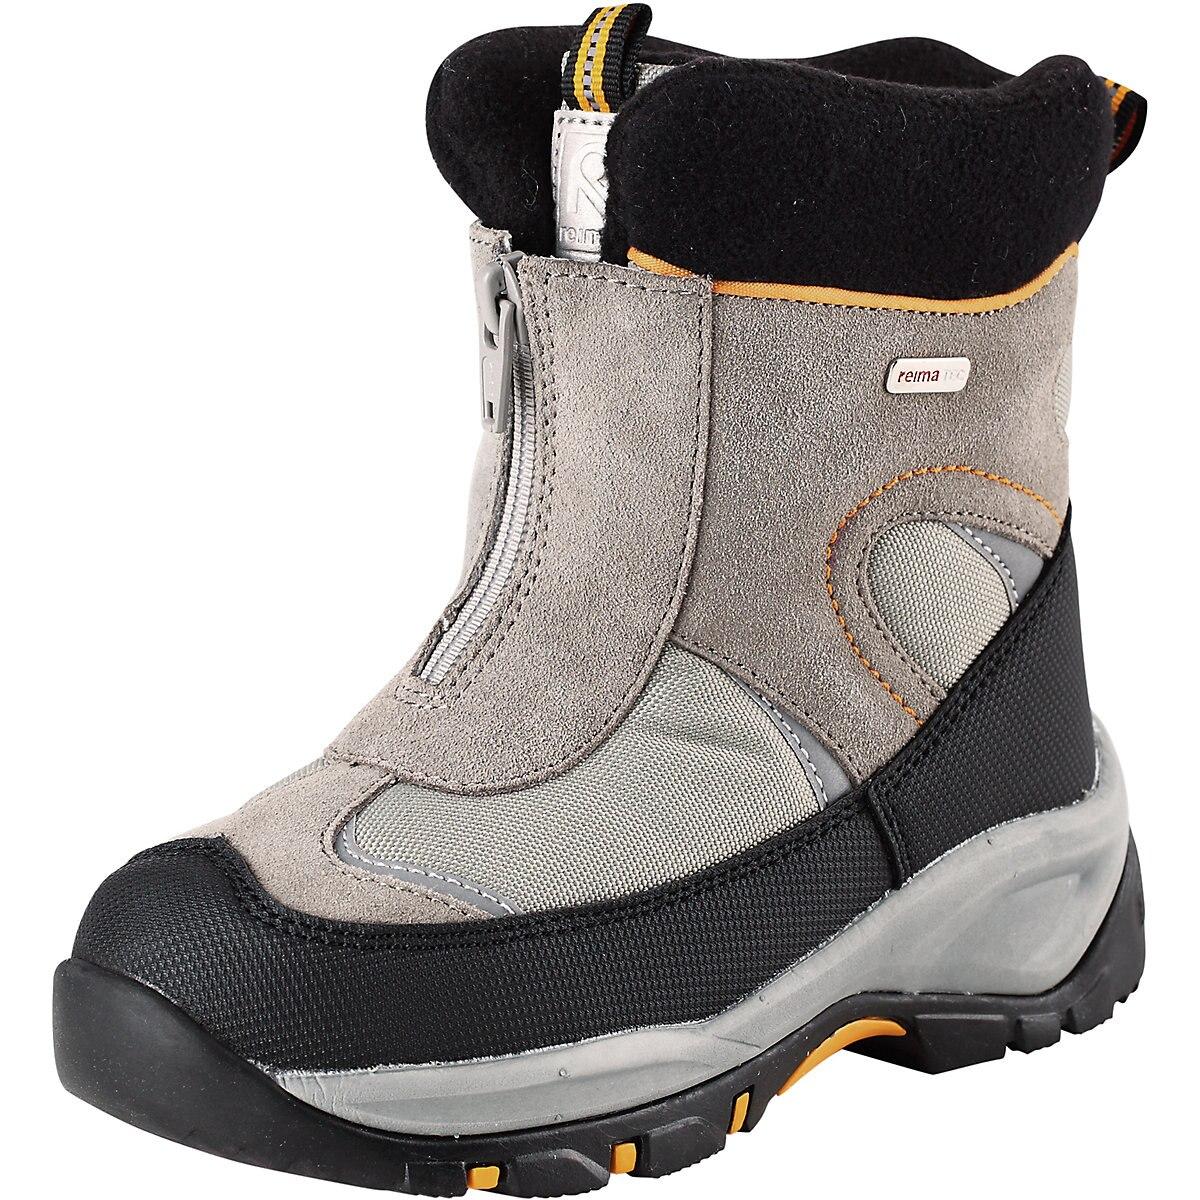 REIMA Boots 8624835 for boys winter boy  children shoes reima boots 8624963 for boys winter boy baby shoes